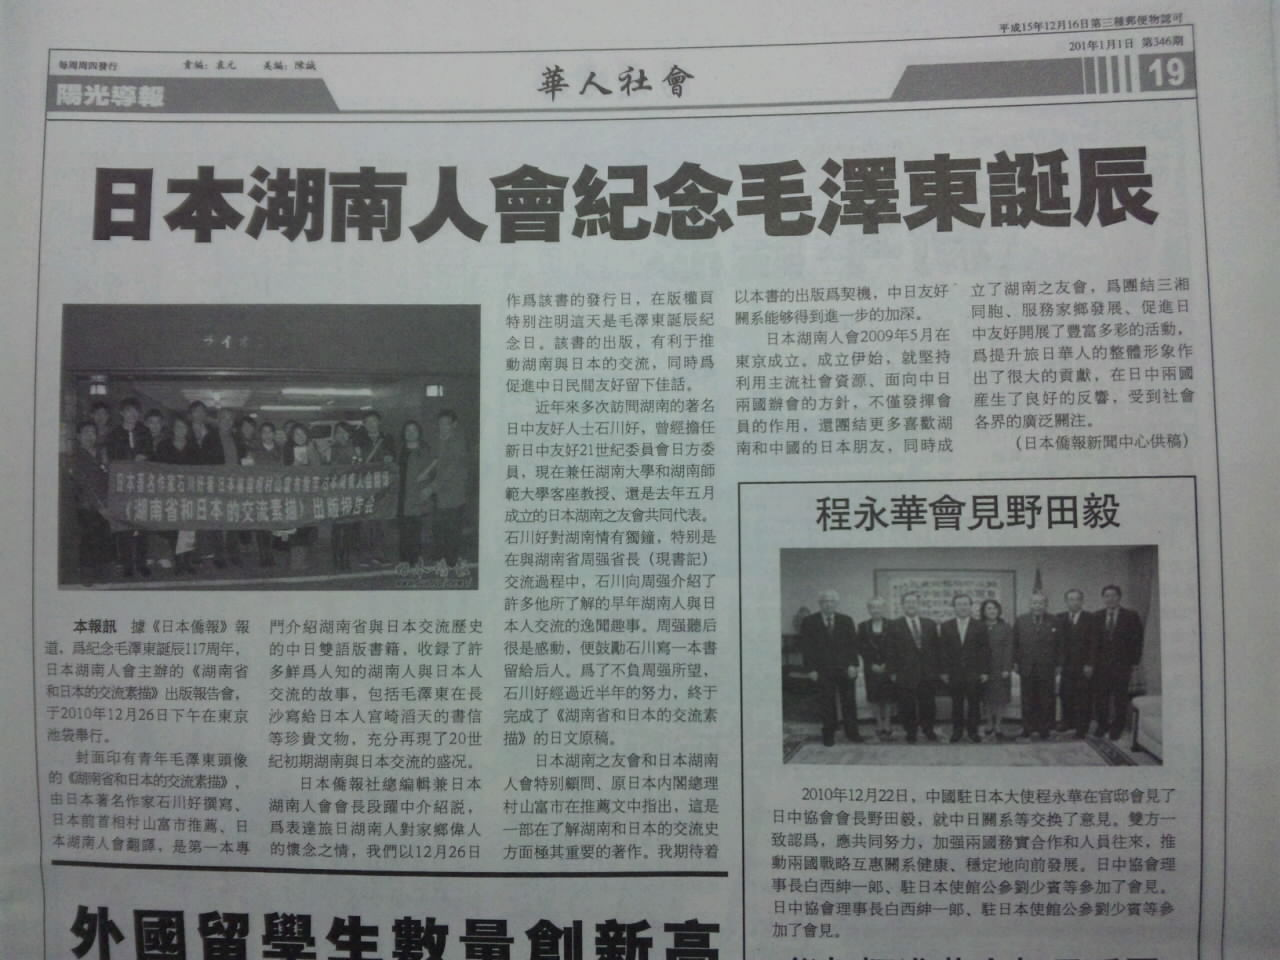 陽光導報 日本湖南人会主催の毛沢東生誕117年紀念会を大きく報道_d0027795_18115997.jpg